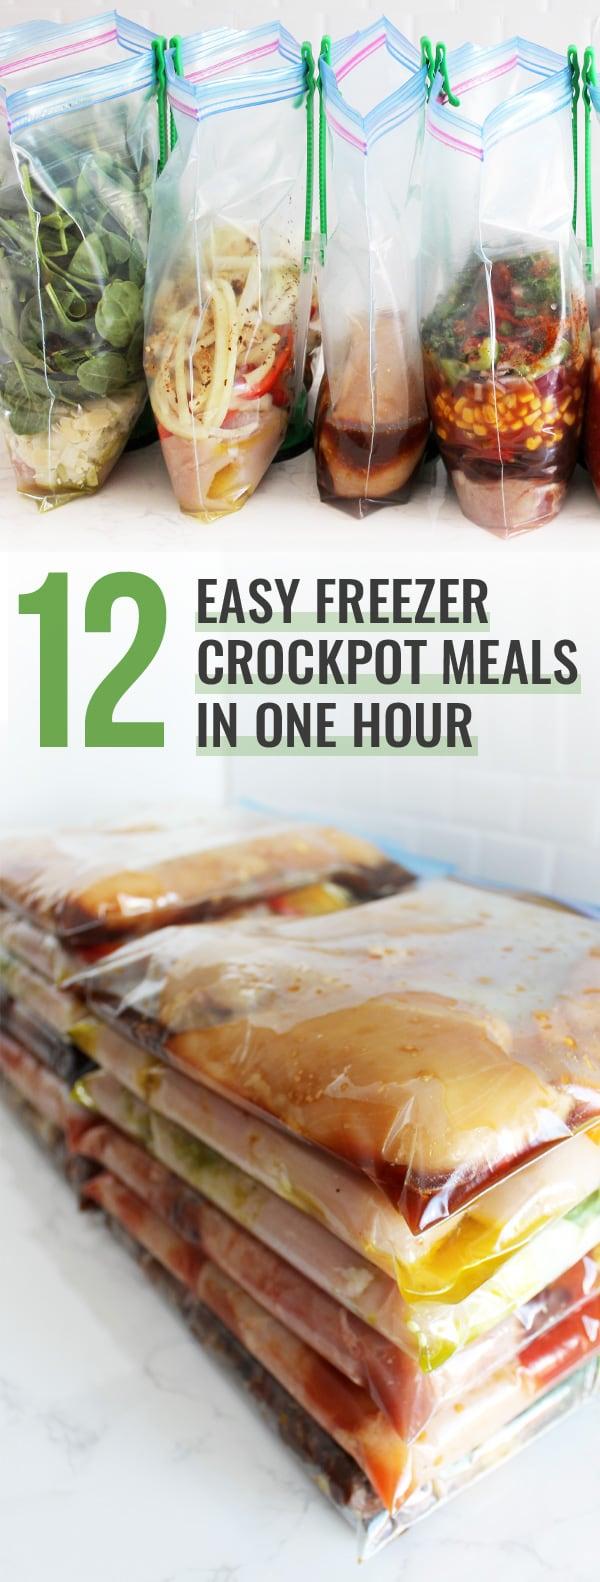 12 Easy Freezer Crockpot Meals in One Hour